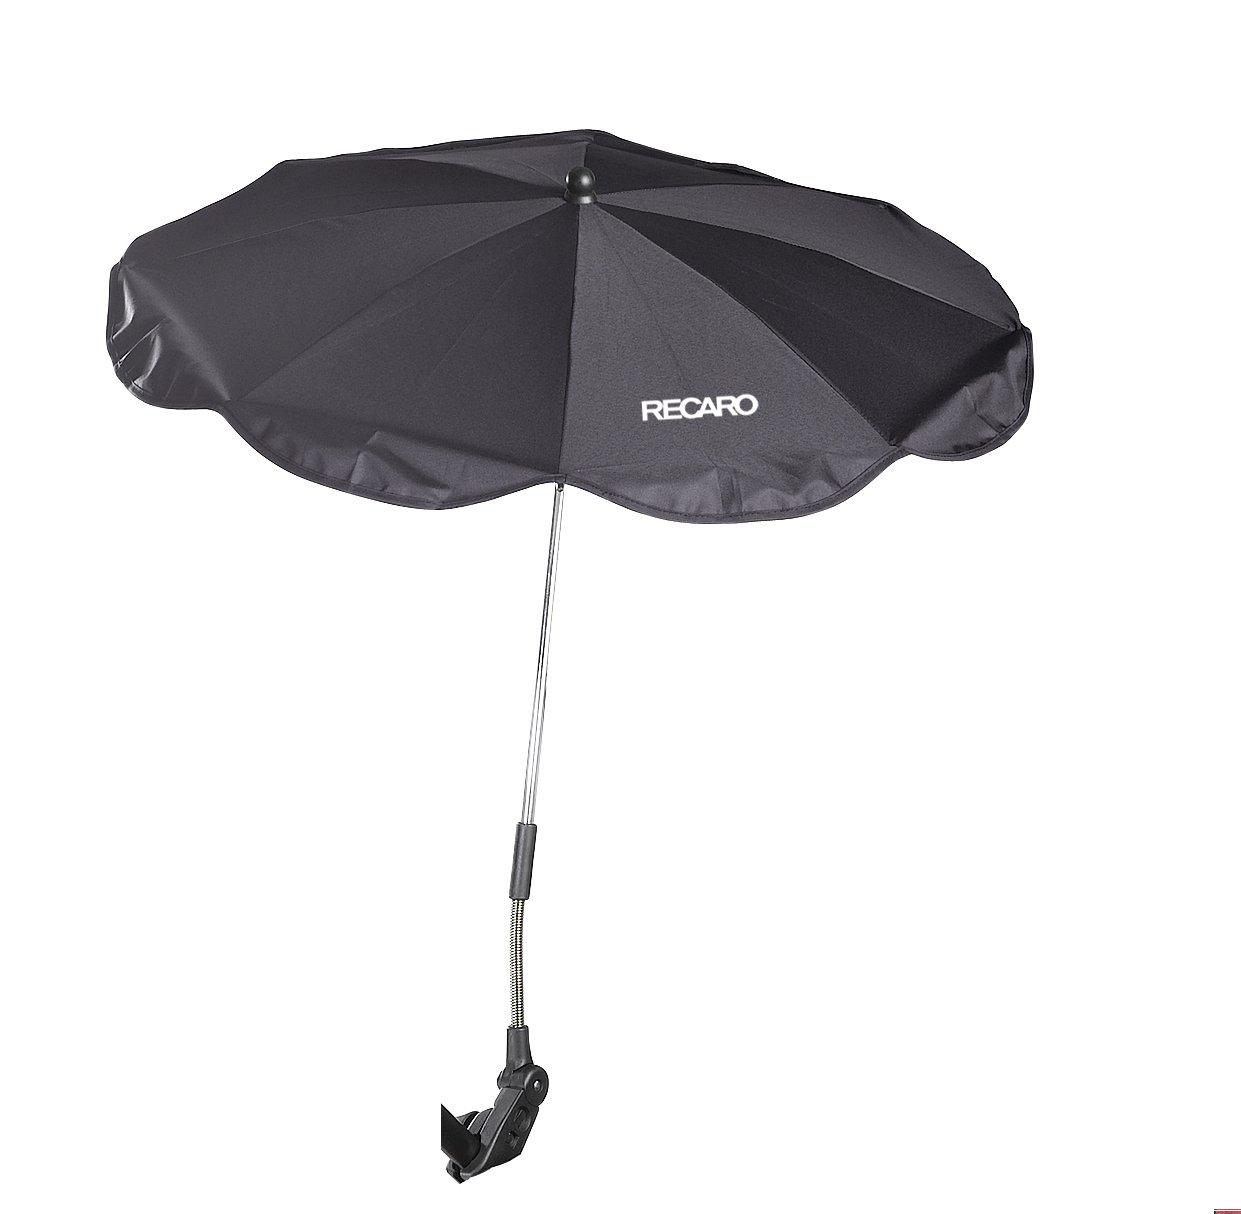 Recaro Zen Edition - Parasol para carrito de bebé: Amazon.es ...